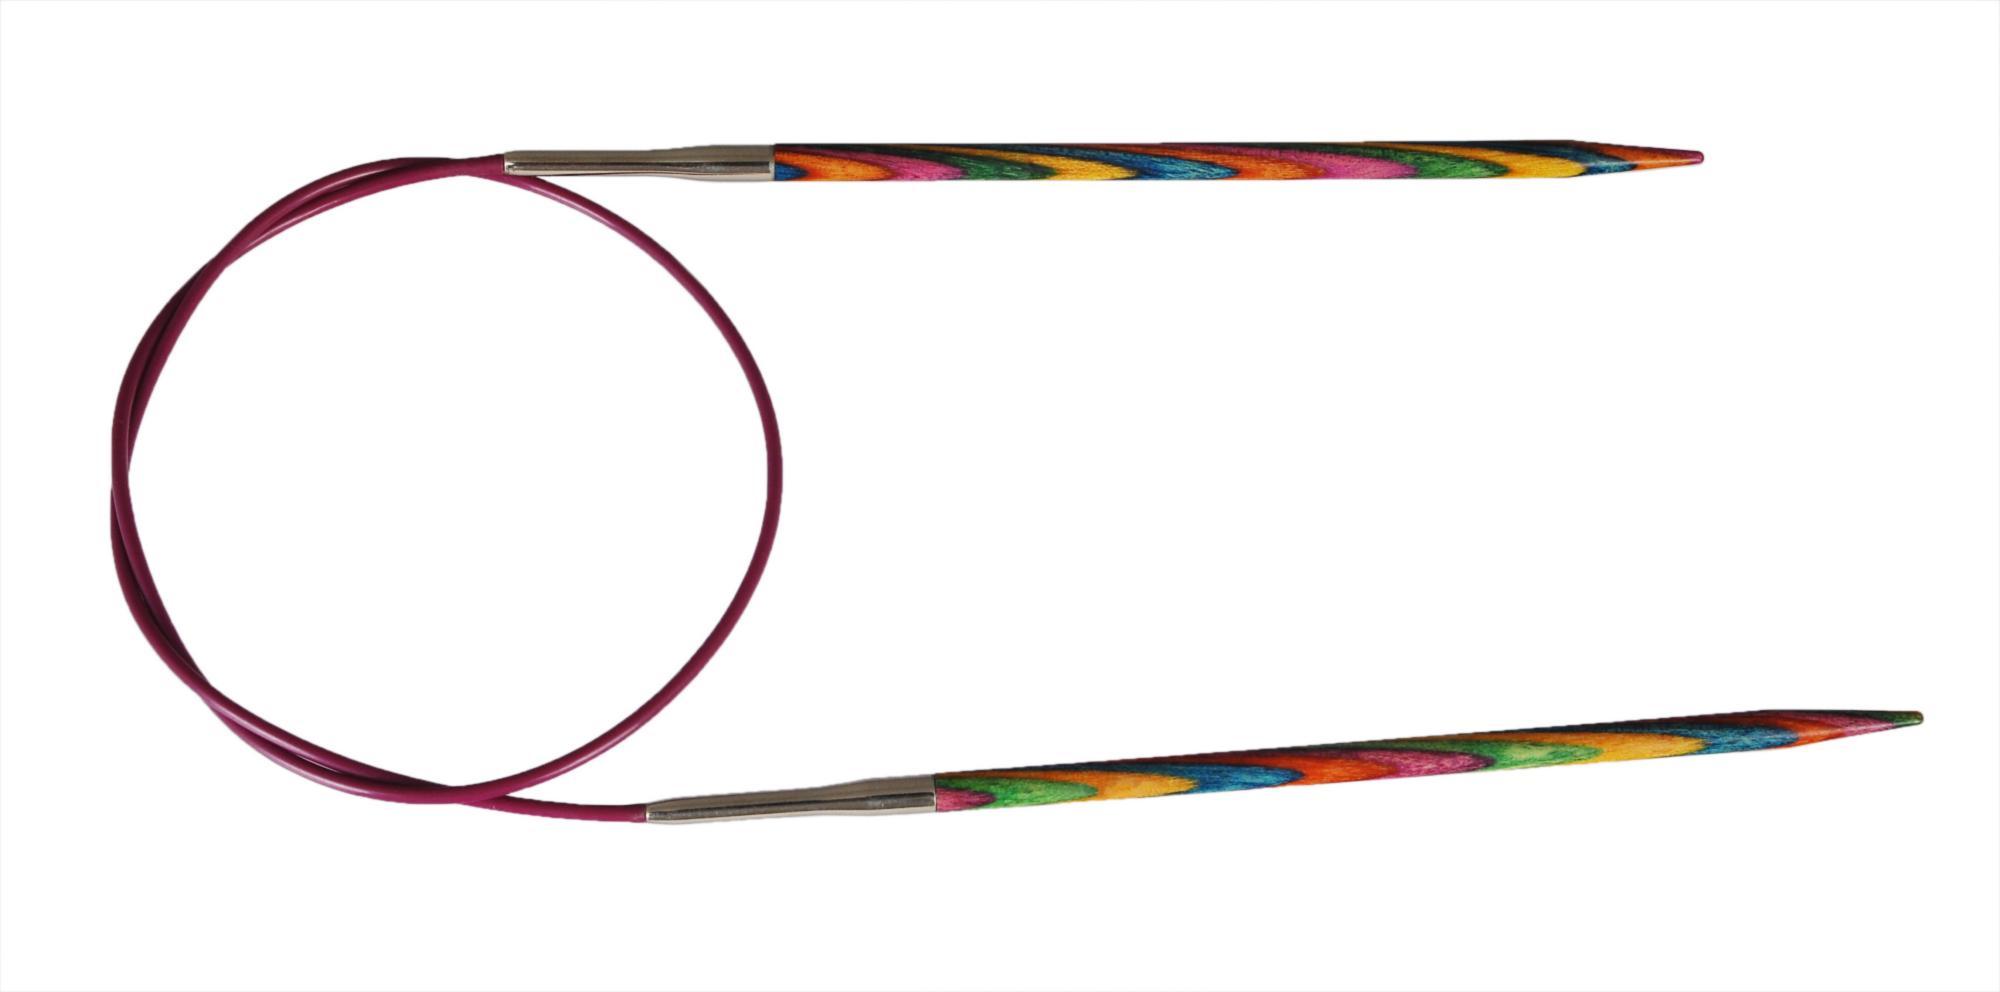 Спицы круговые 120 см Symfonie Wood KnitPro, 21372, 6.50 мм